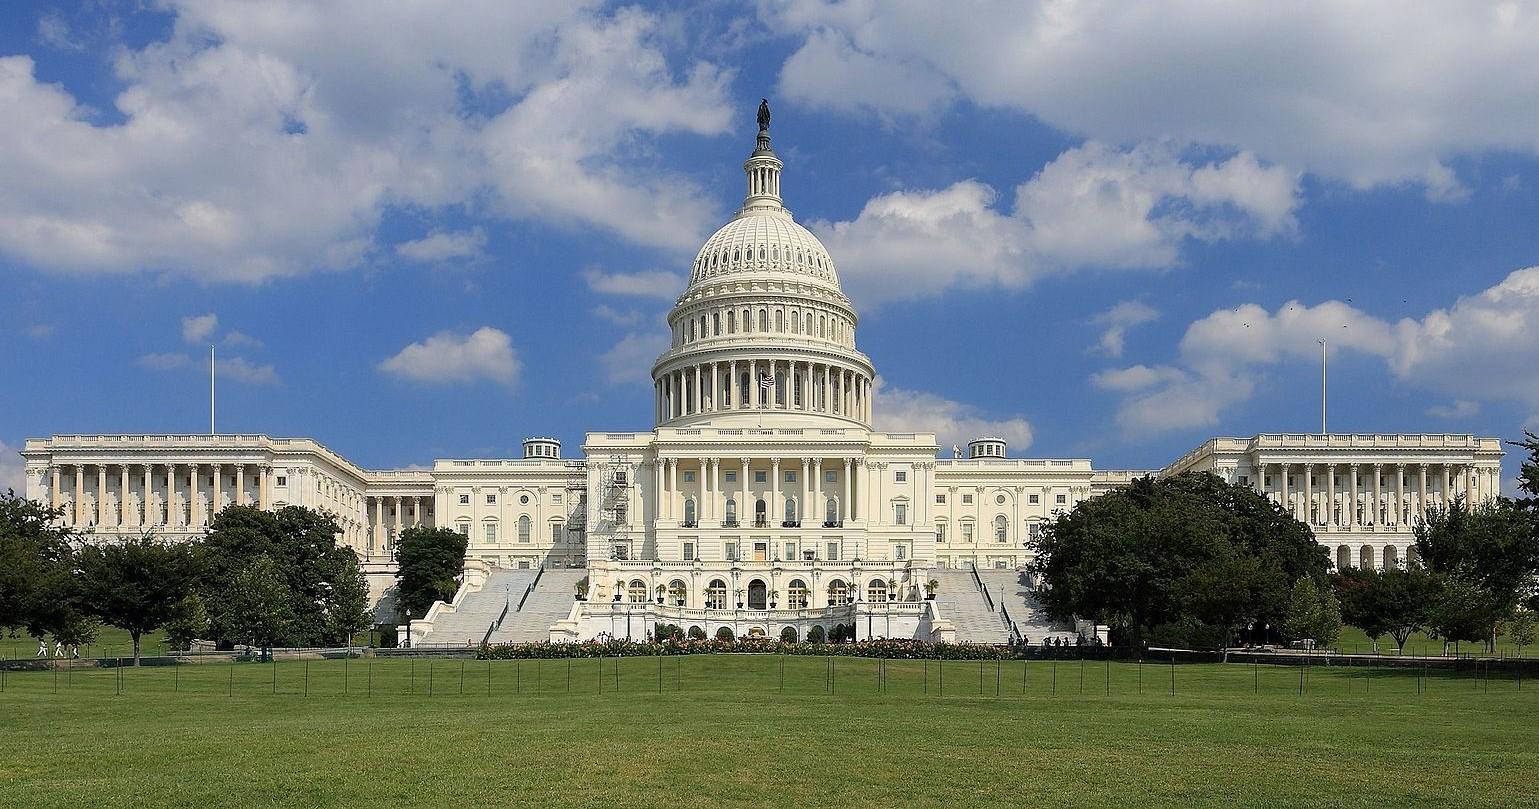 United States Capitol, Capitol Hill, Washington D.C., 2013